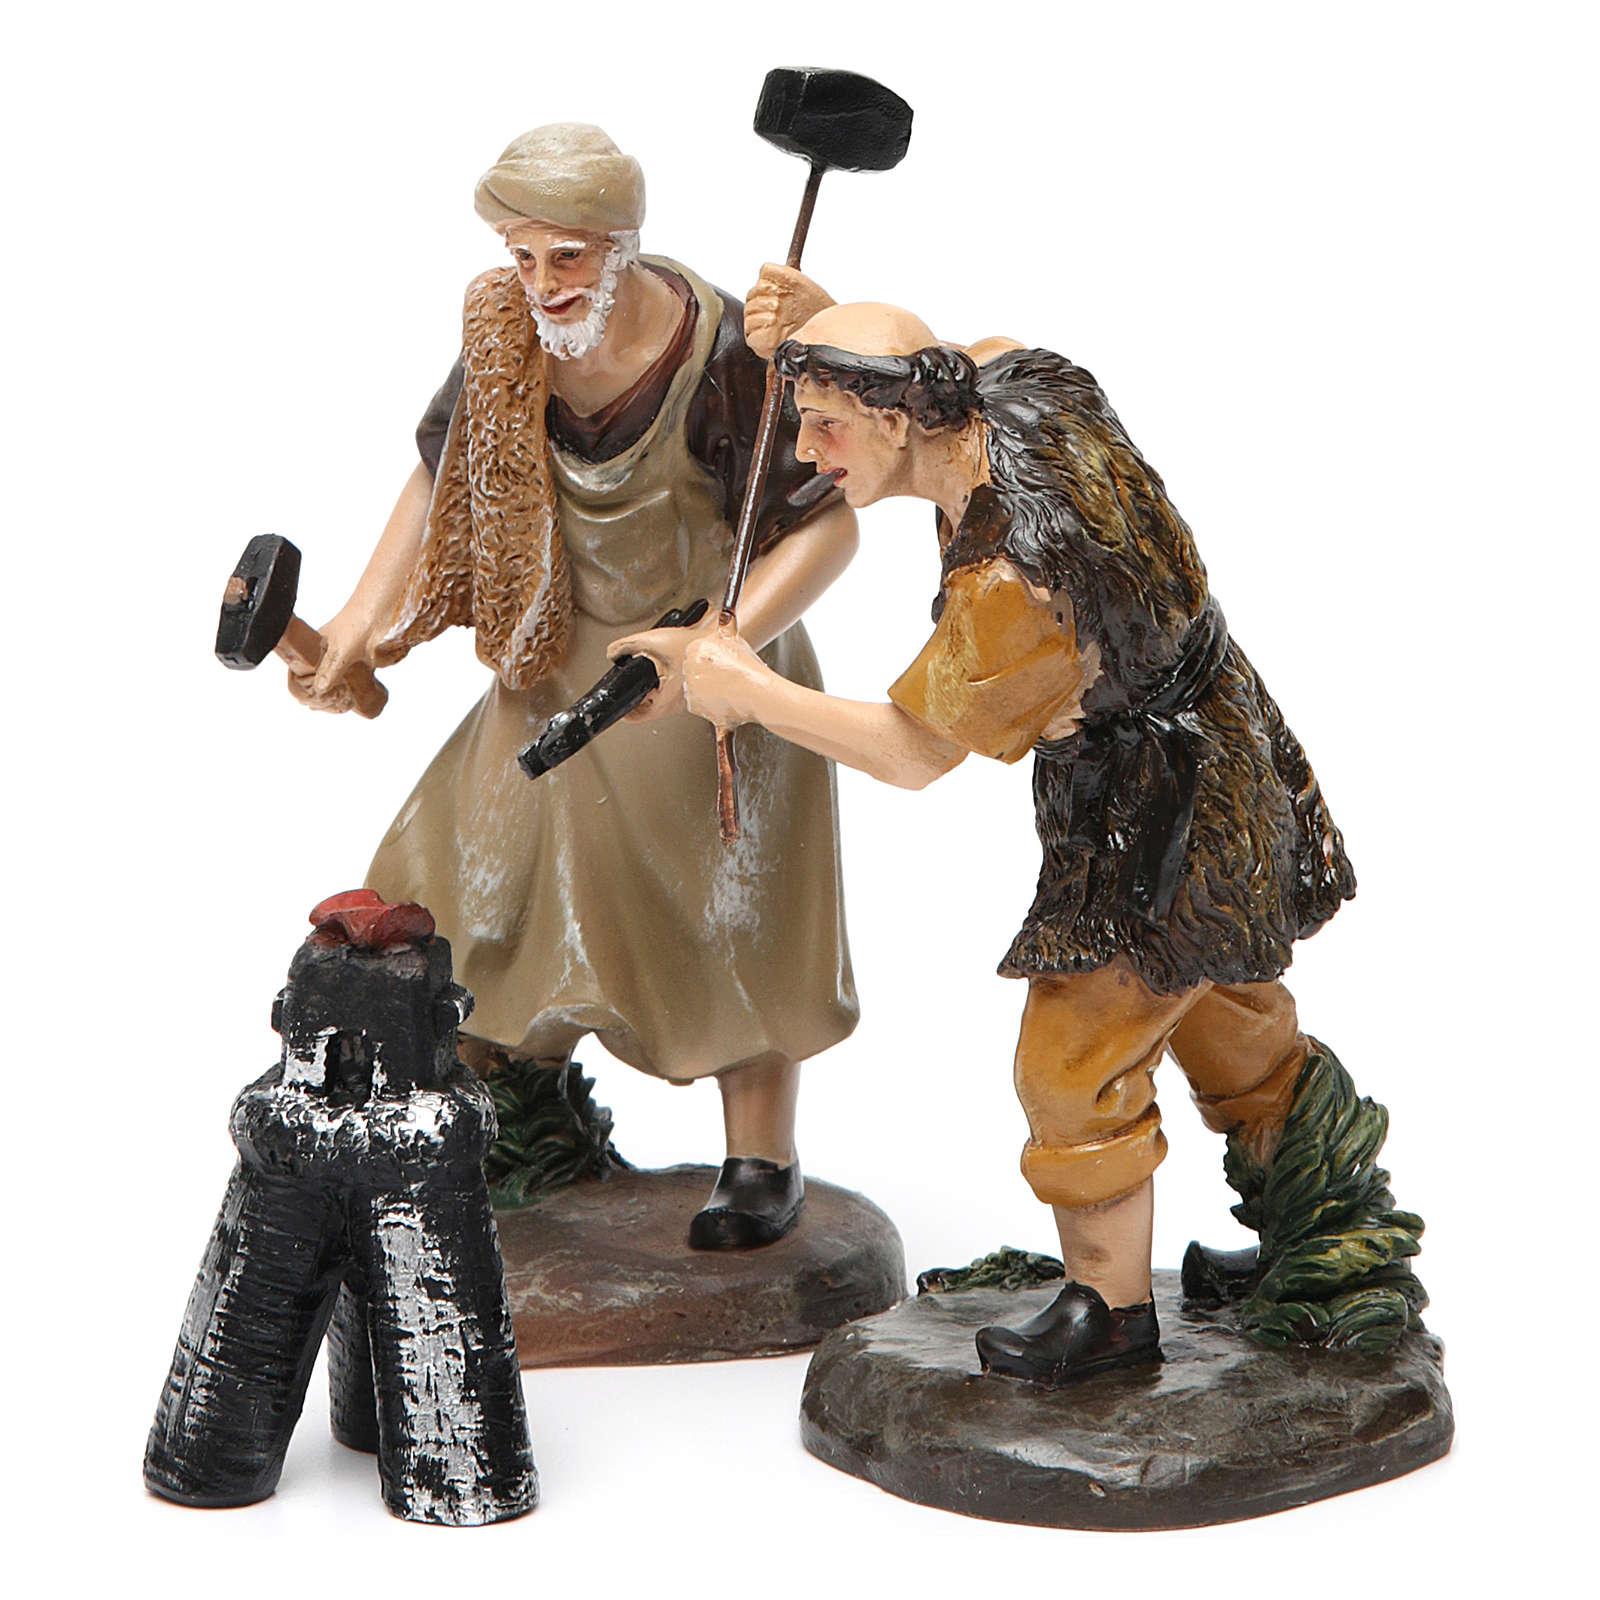 Blacksmiths with forge 13 cm 3 pcs 3